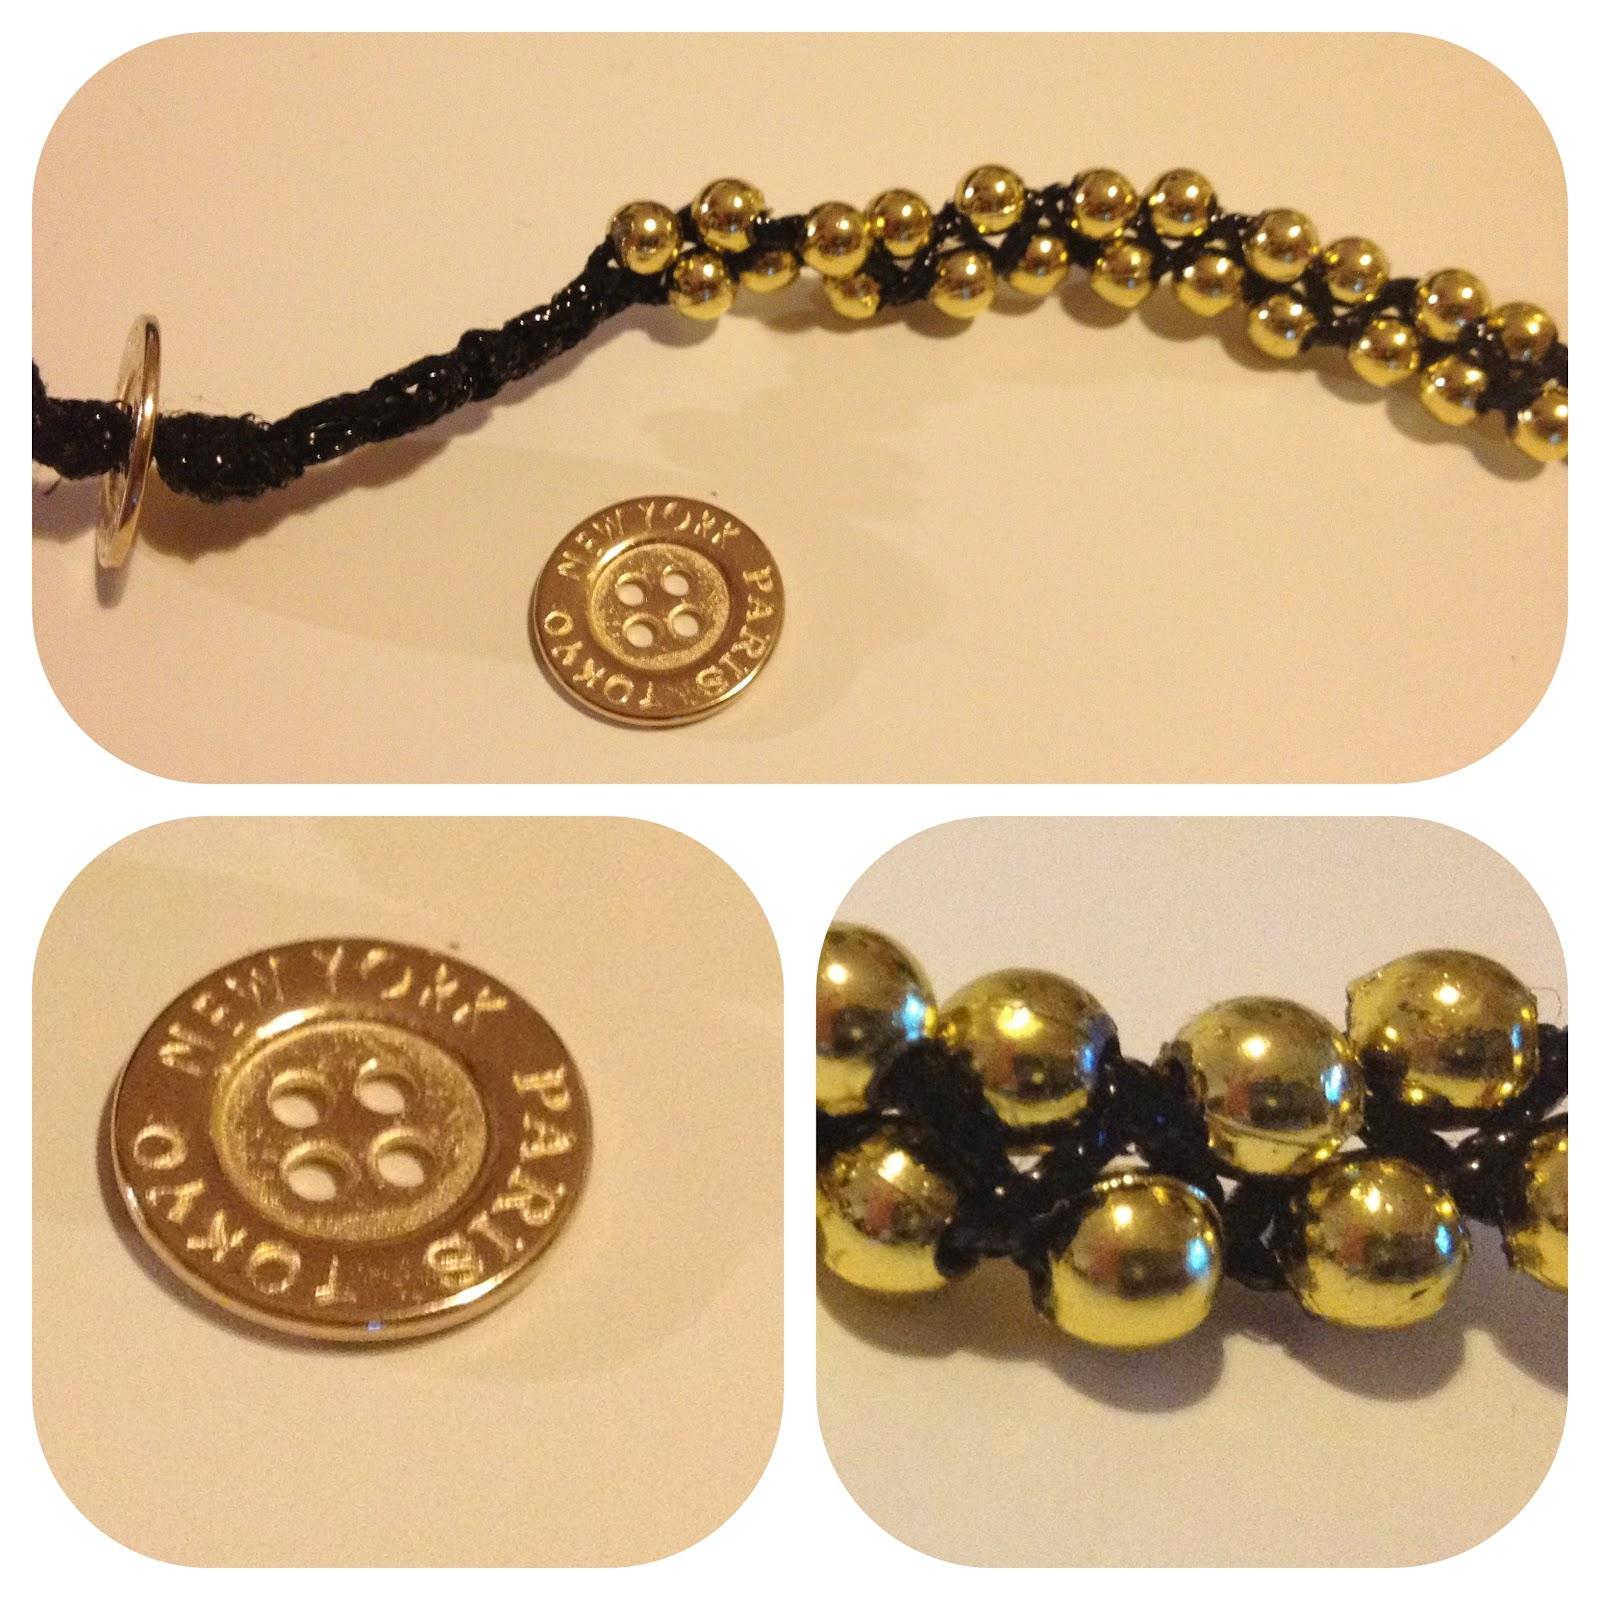 Diy Beads: DIY Braided Bead Bracelet